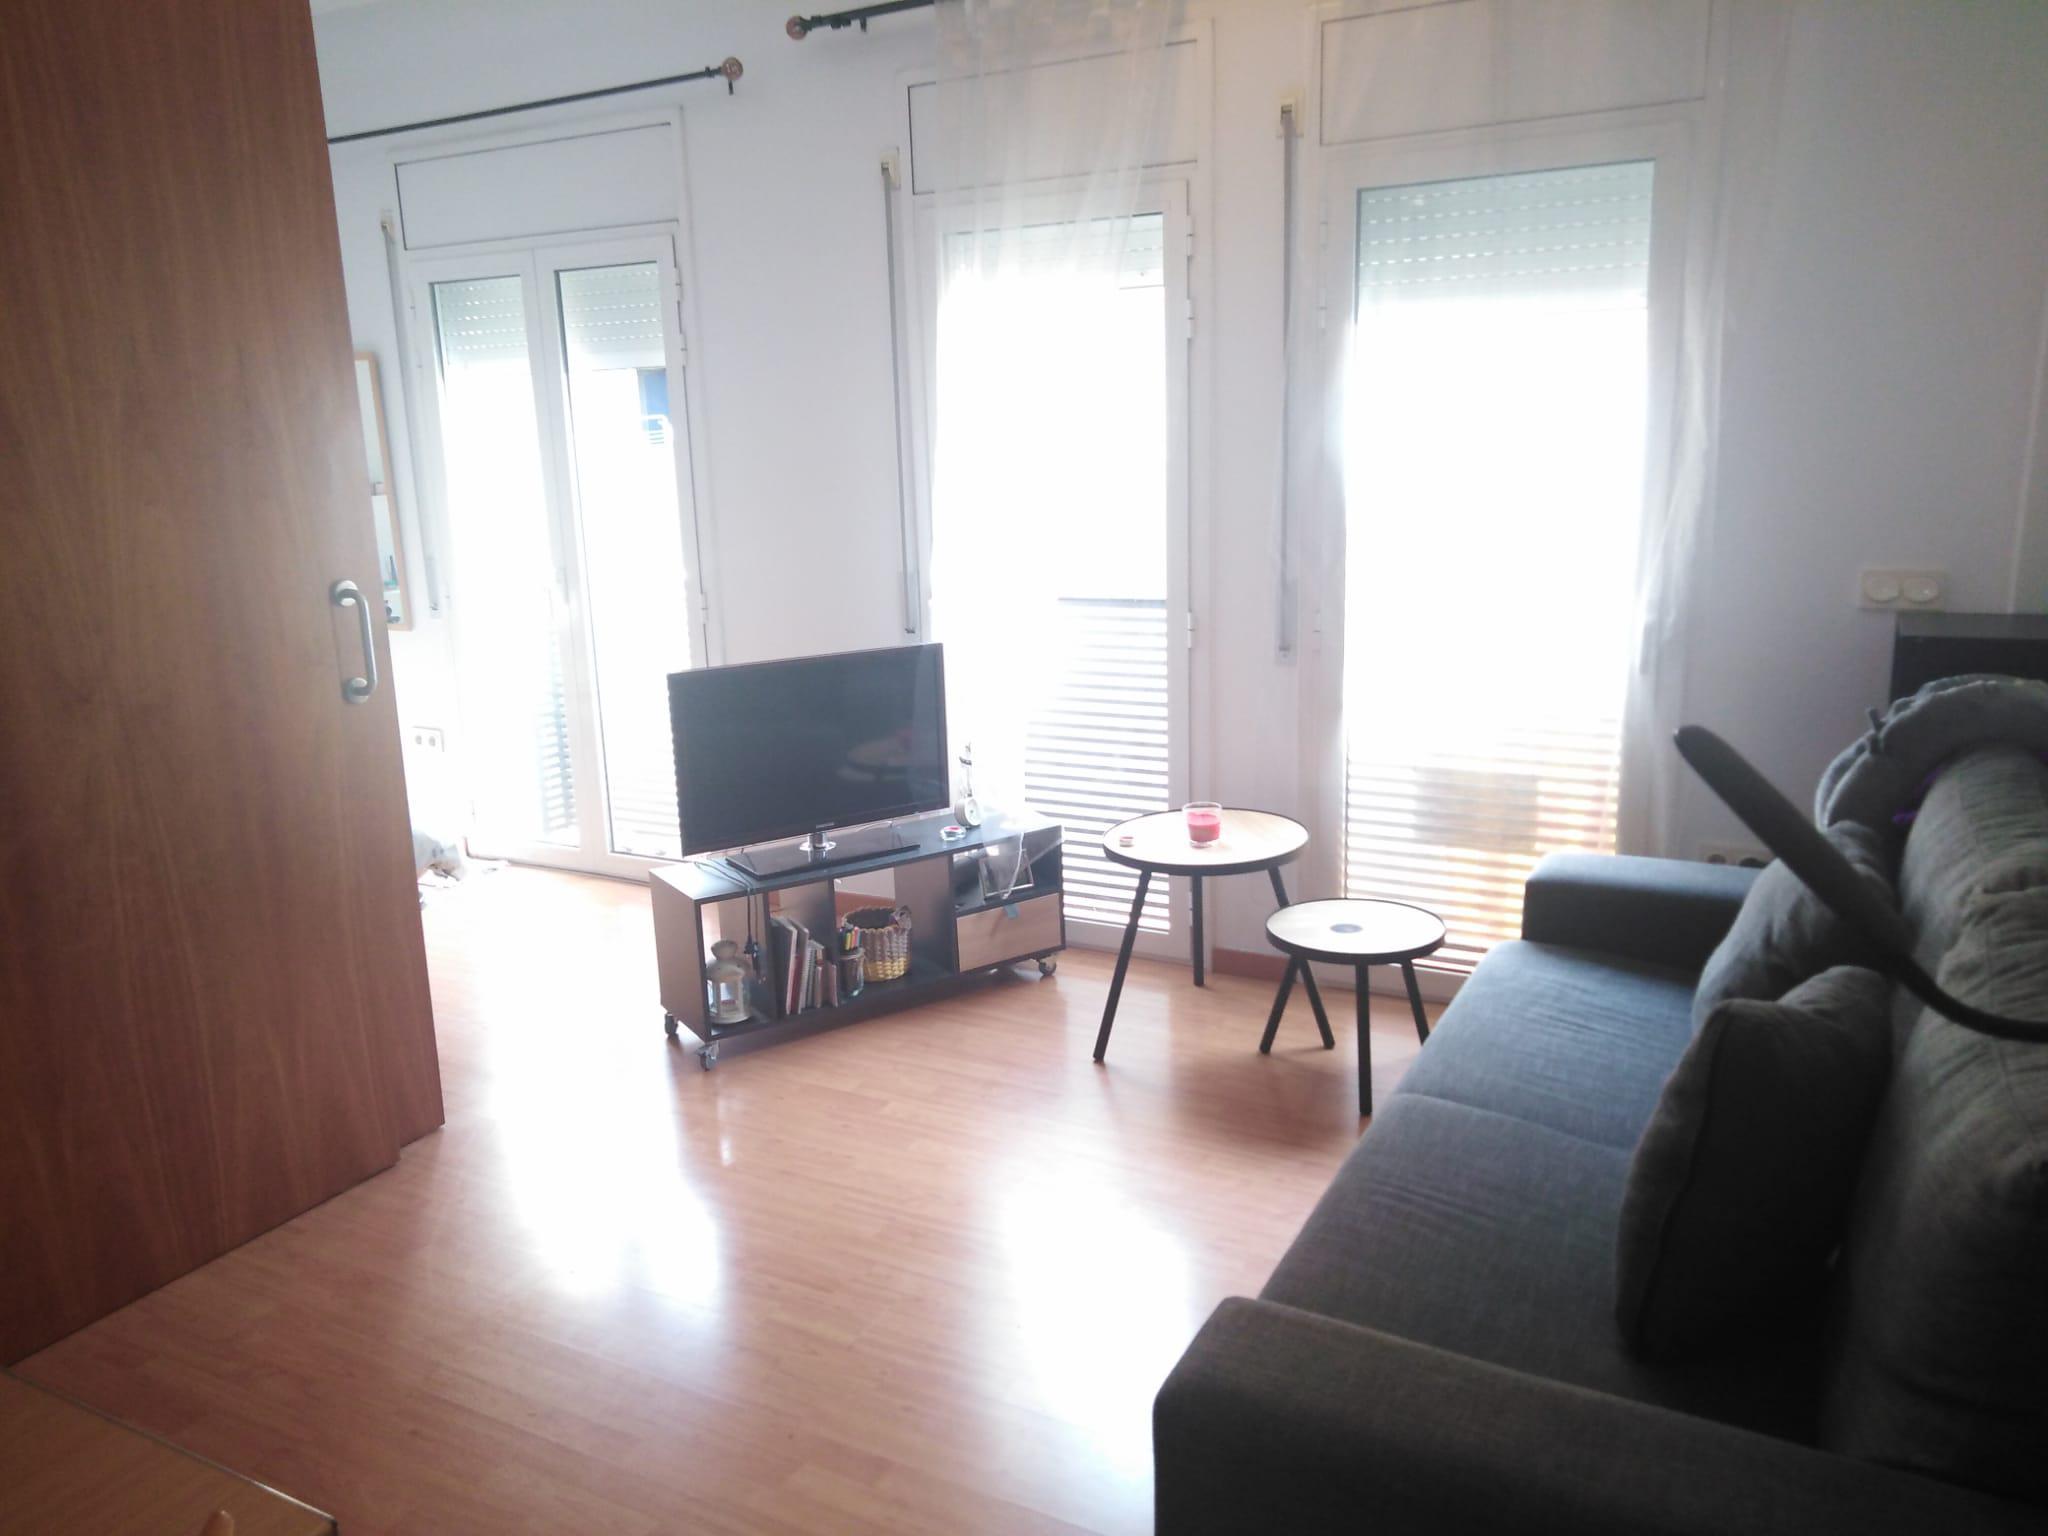 Imagen 1 Piso en venta en Girona / Pis seminou situat al costat de la nova Clinica Girona